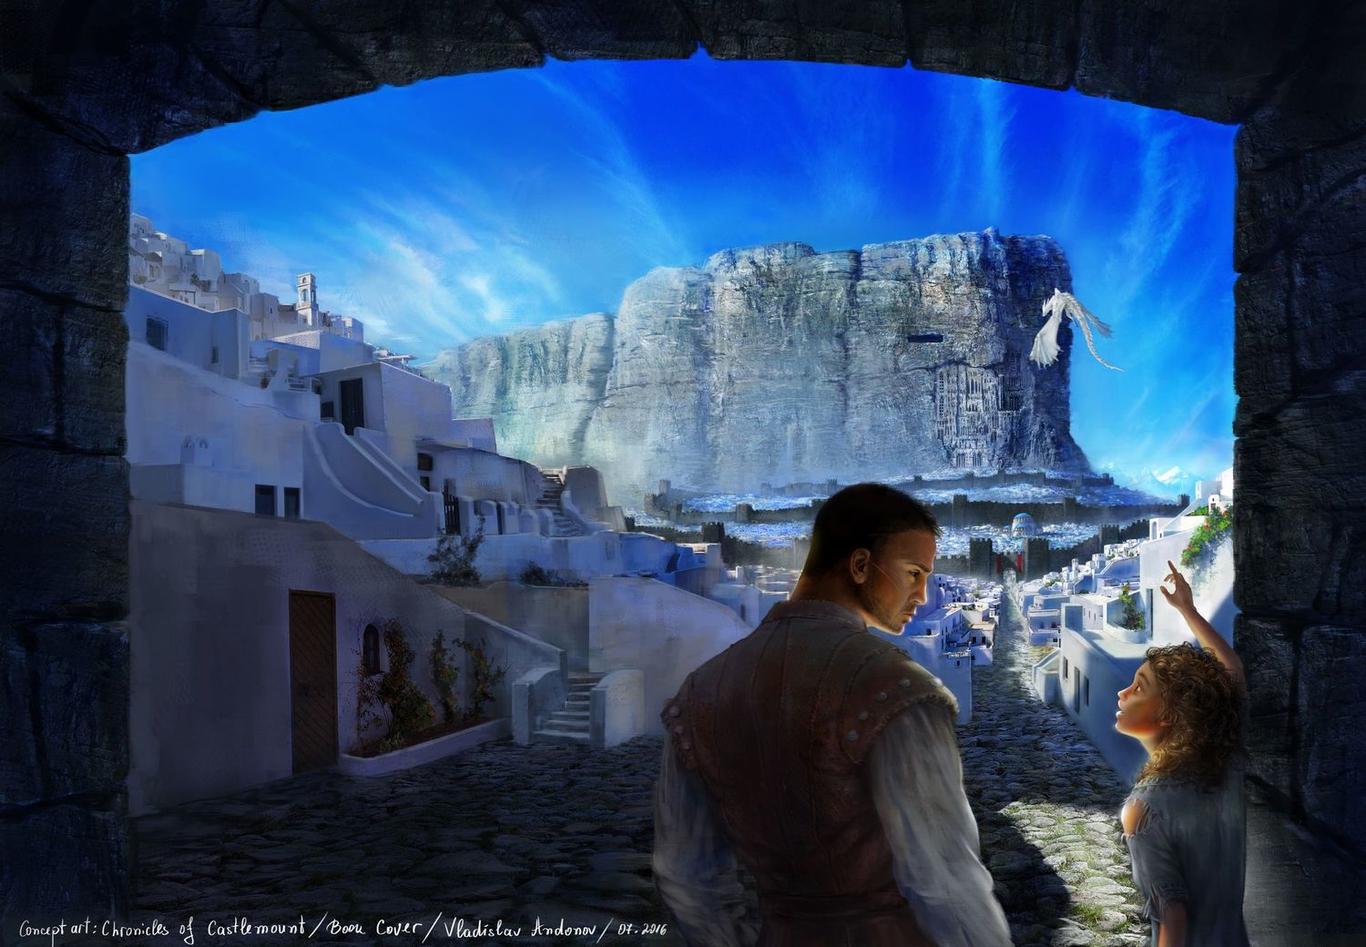 Angelicosphosphoro castlemount chronicl 1 82992a19 d0we